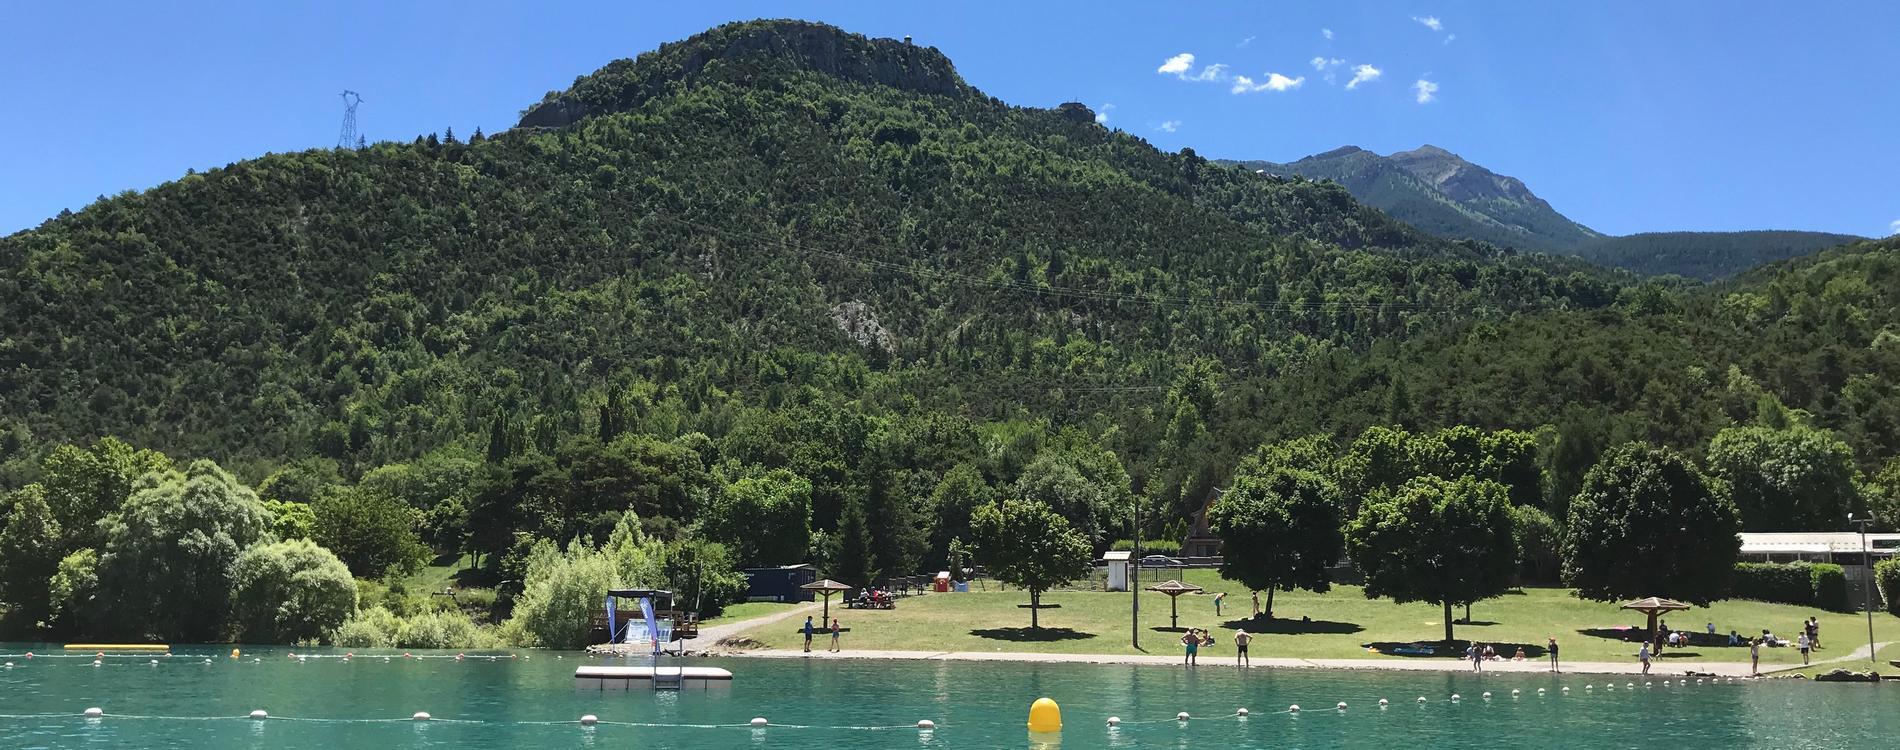 camping_lac_serre_poncon_activites_plage_1900x750